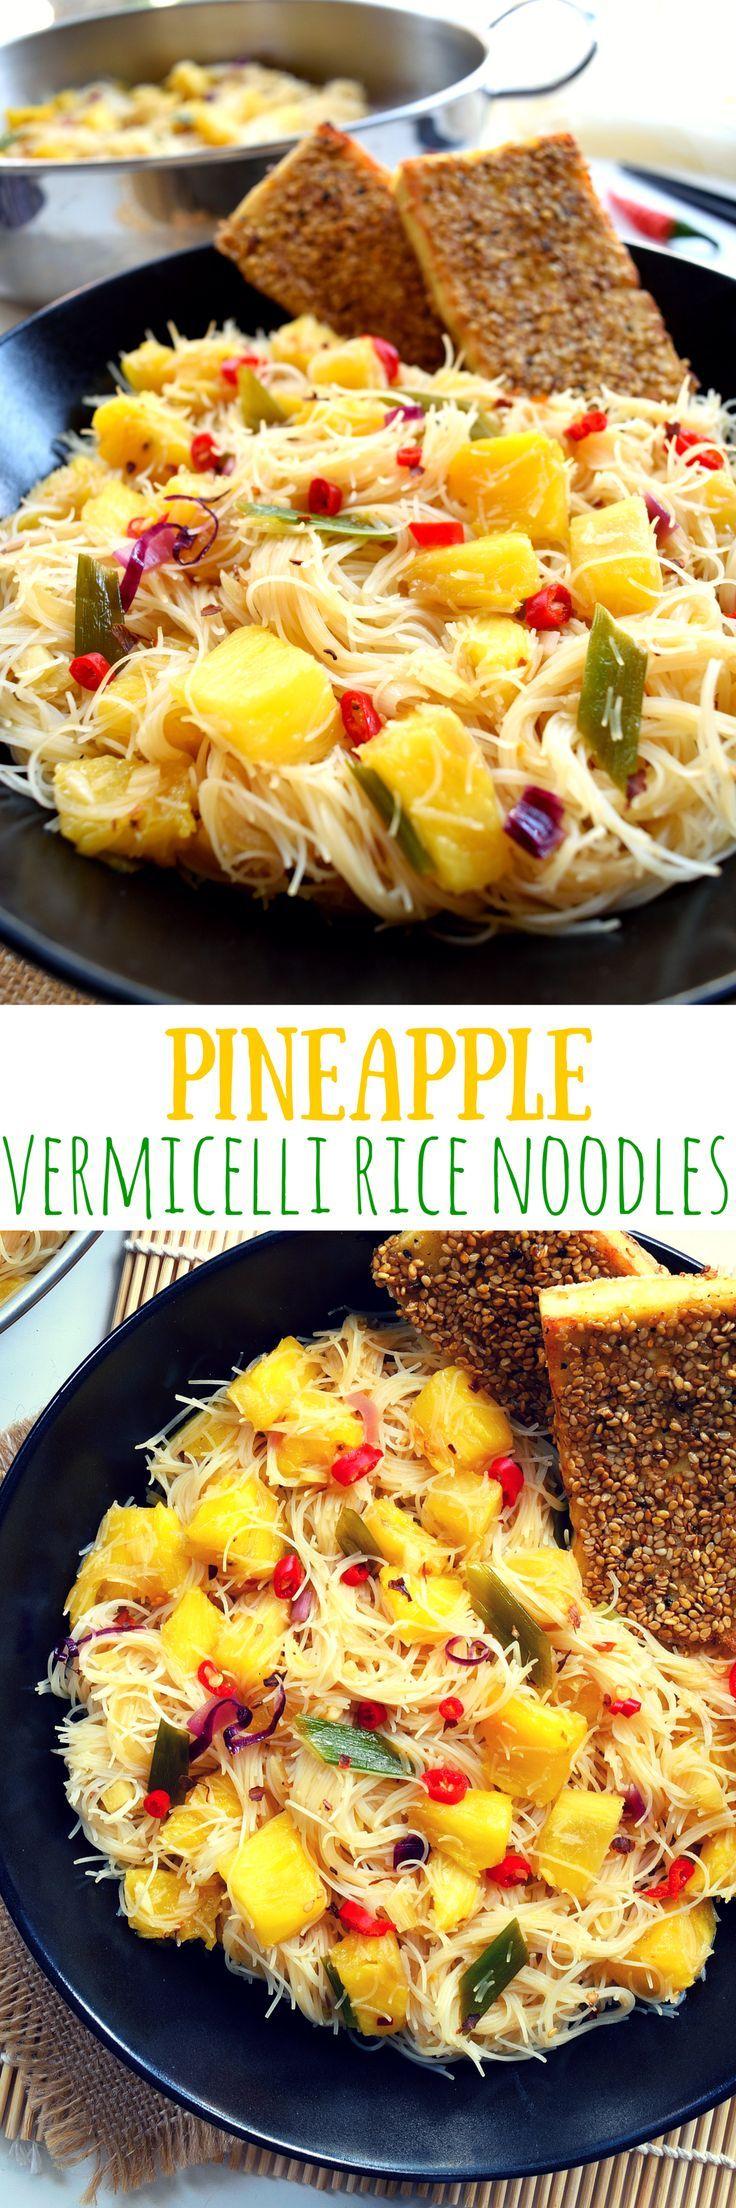 Noodles de arroz Vermicelli con piña